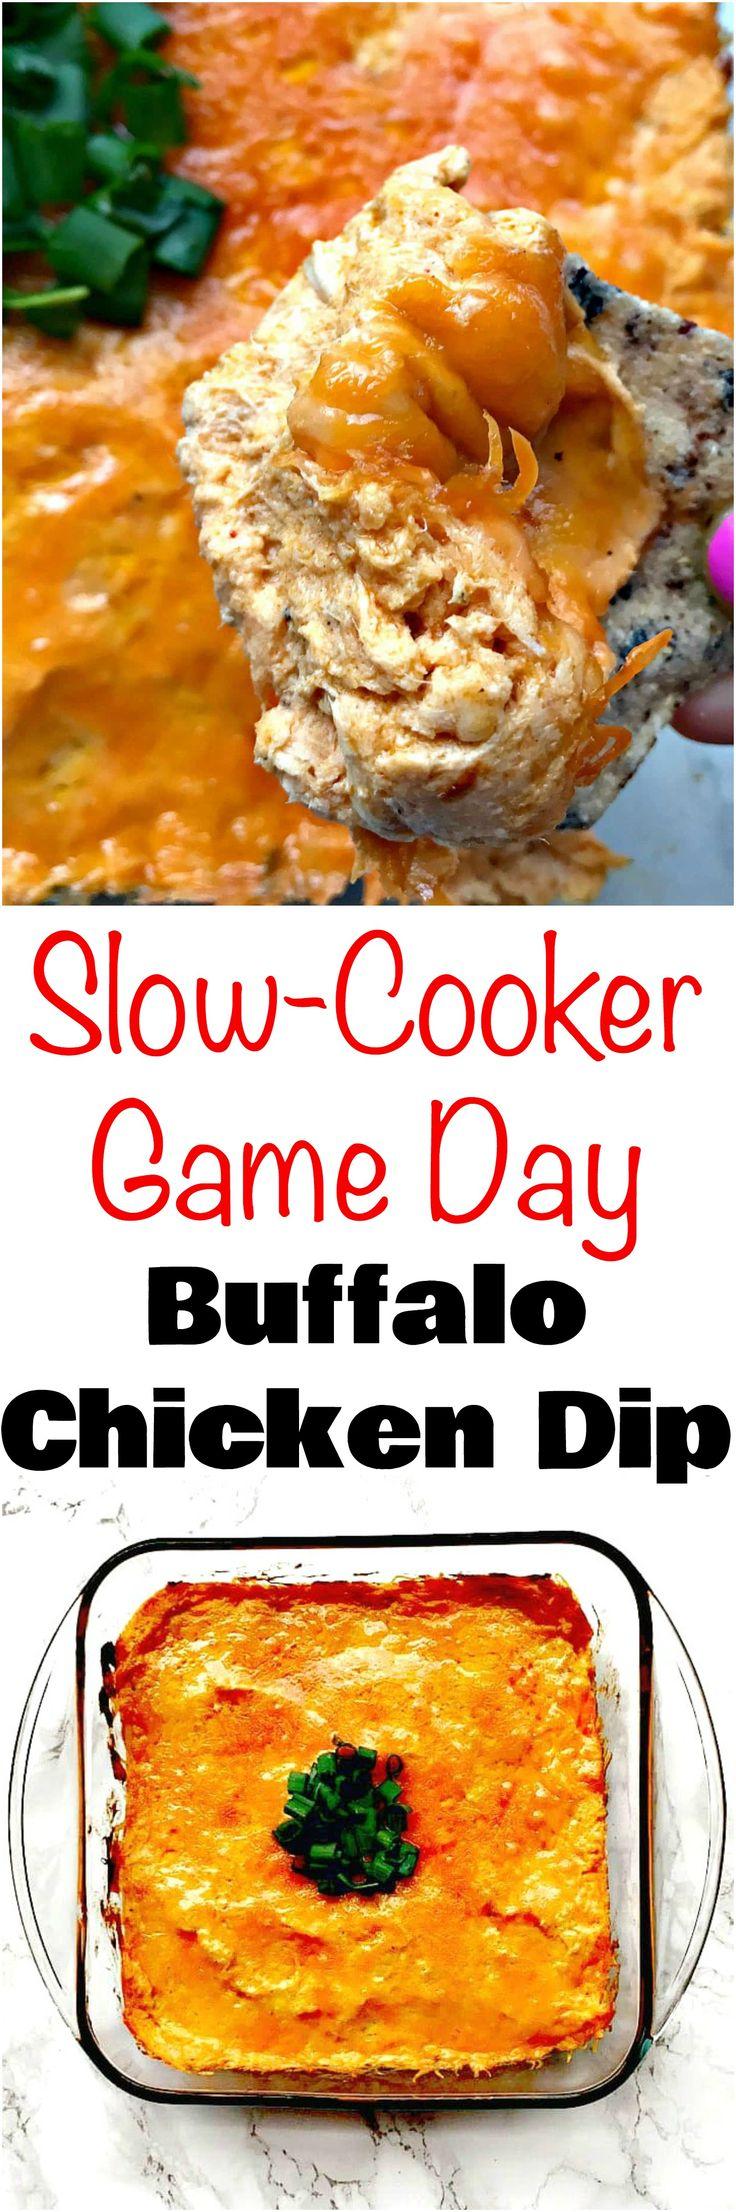 Low-Carb Buffalo Chicken Dip